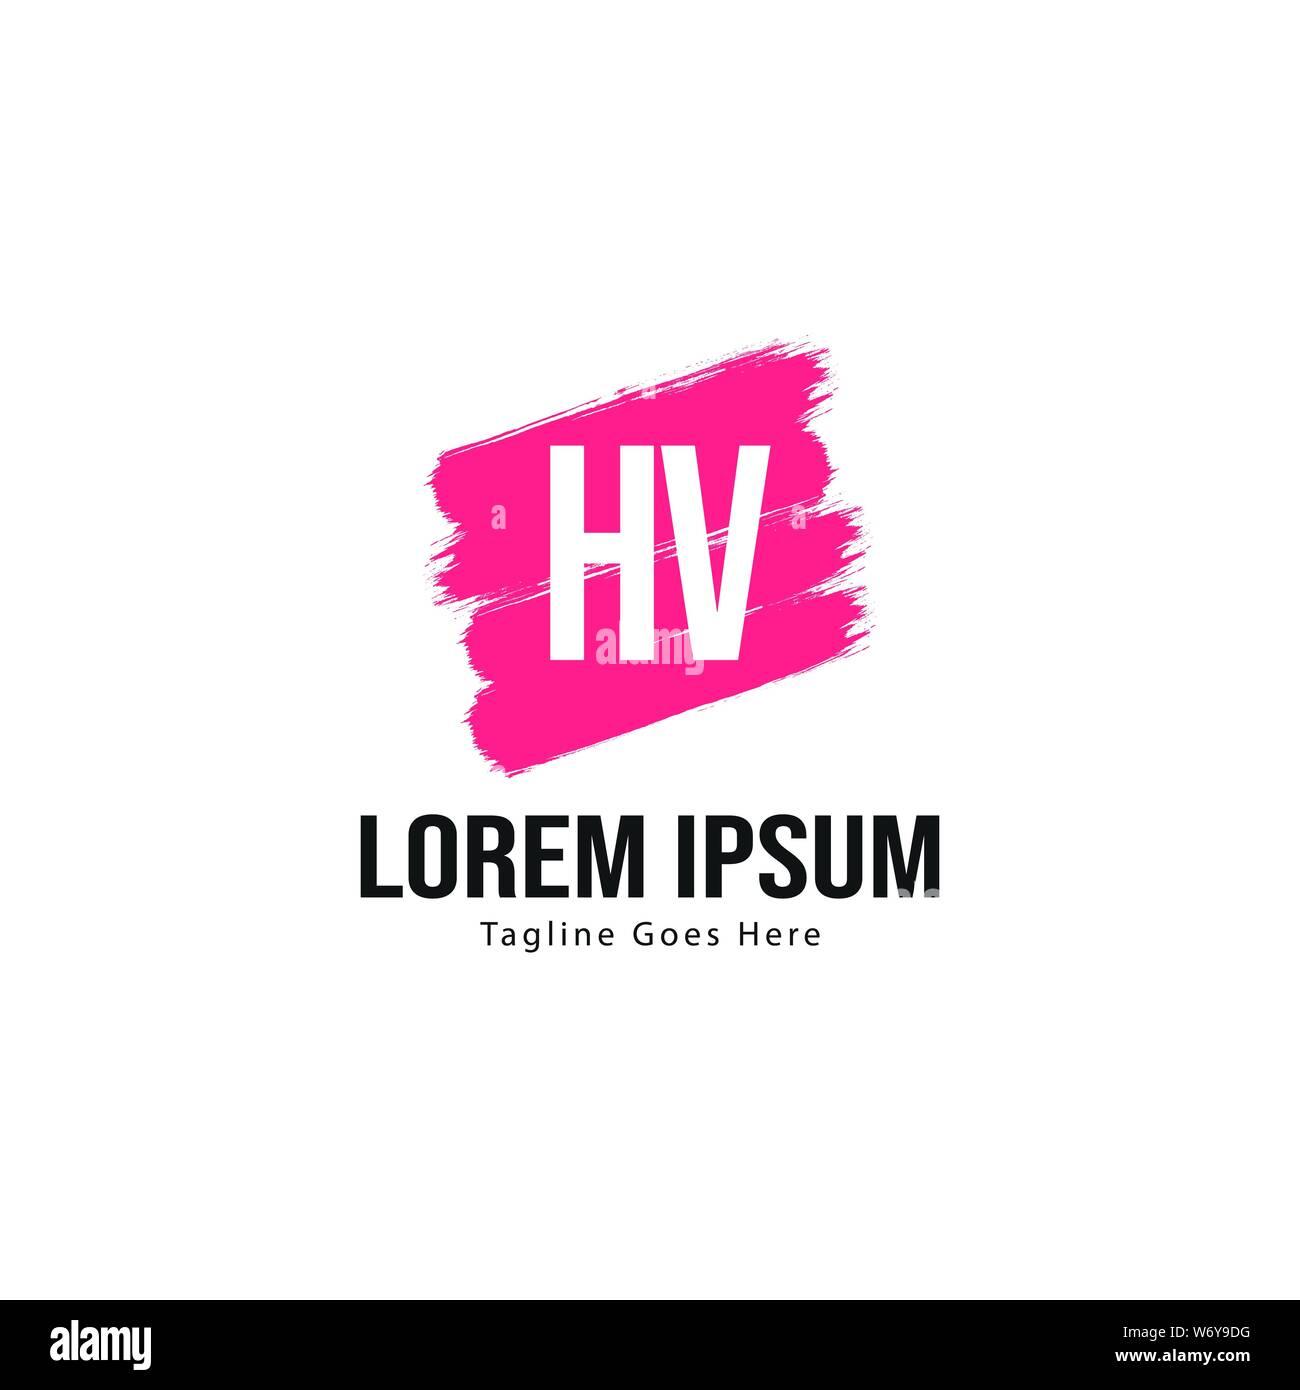 Initial Hv Logo Template With Modern Frame Minimalist Hv Letter Logo Vector Illustration Design Stock Vector Image Art Alamy